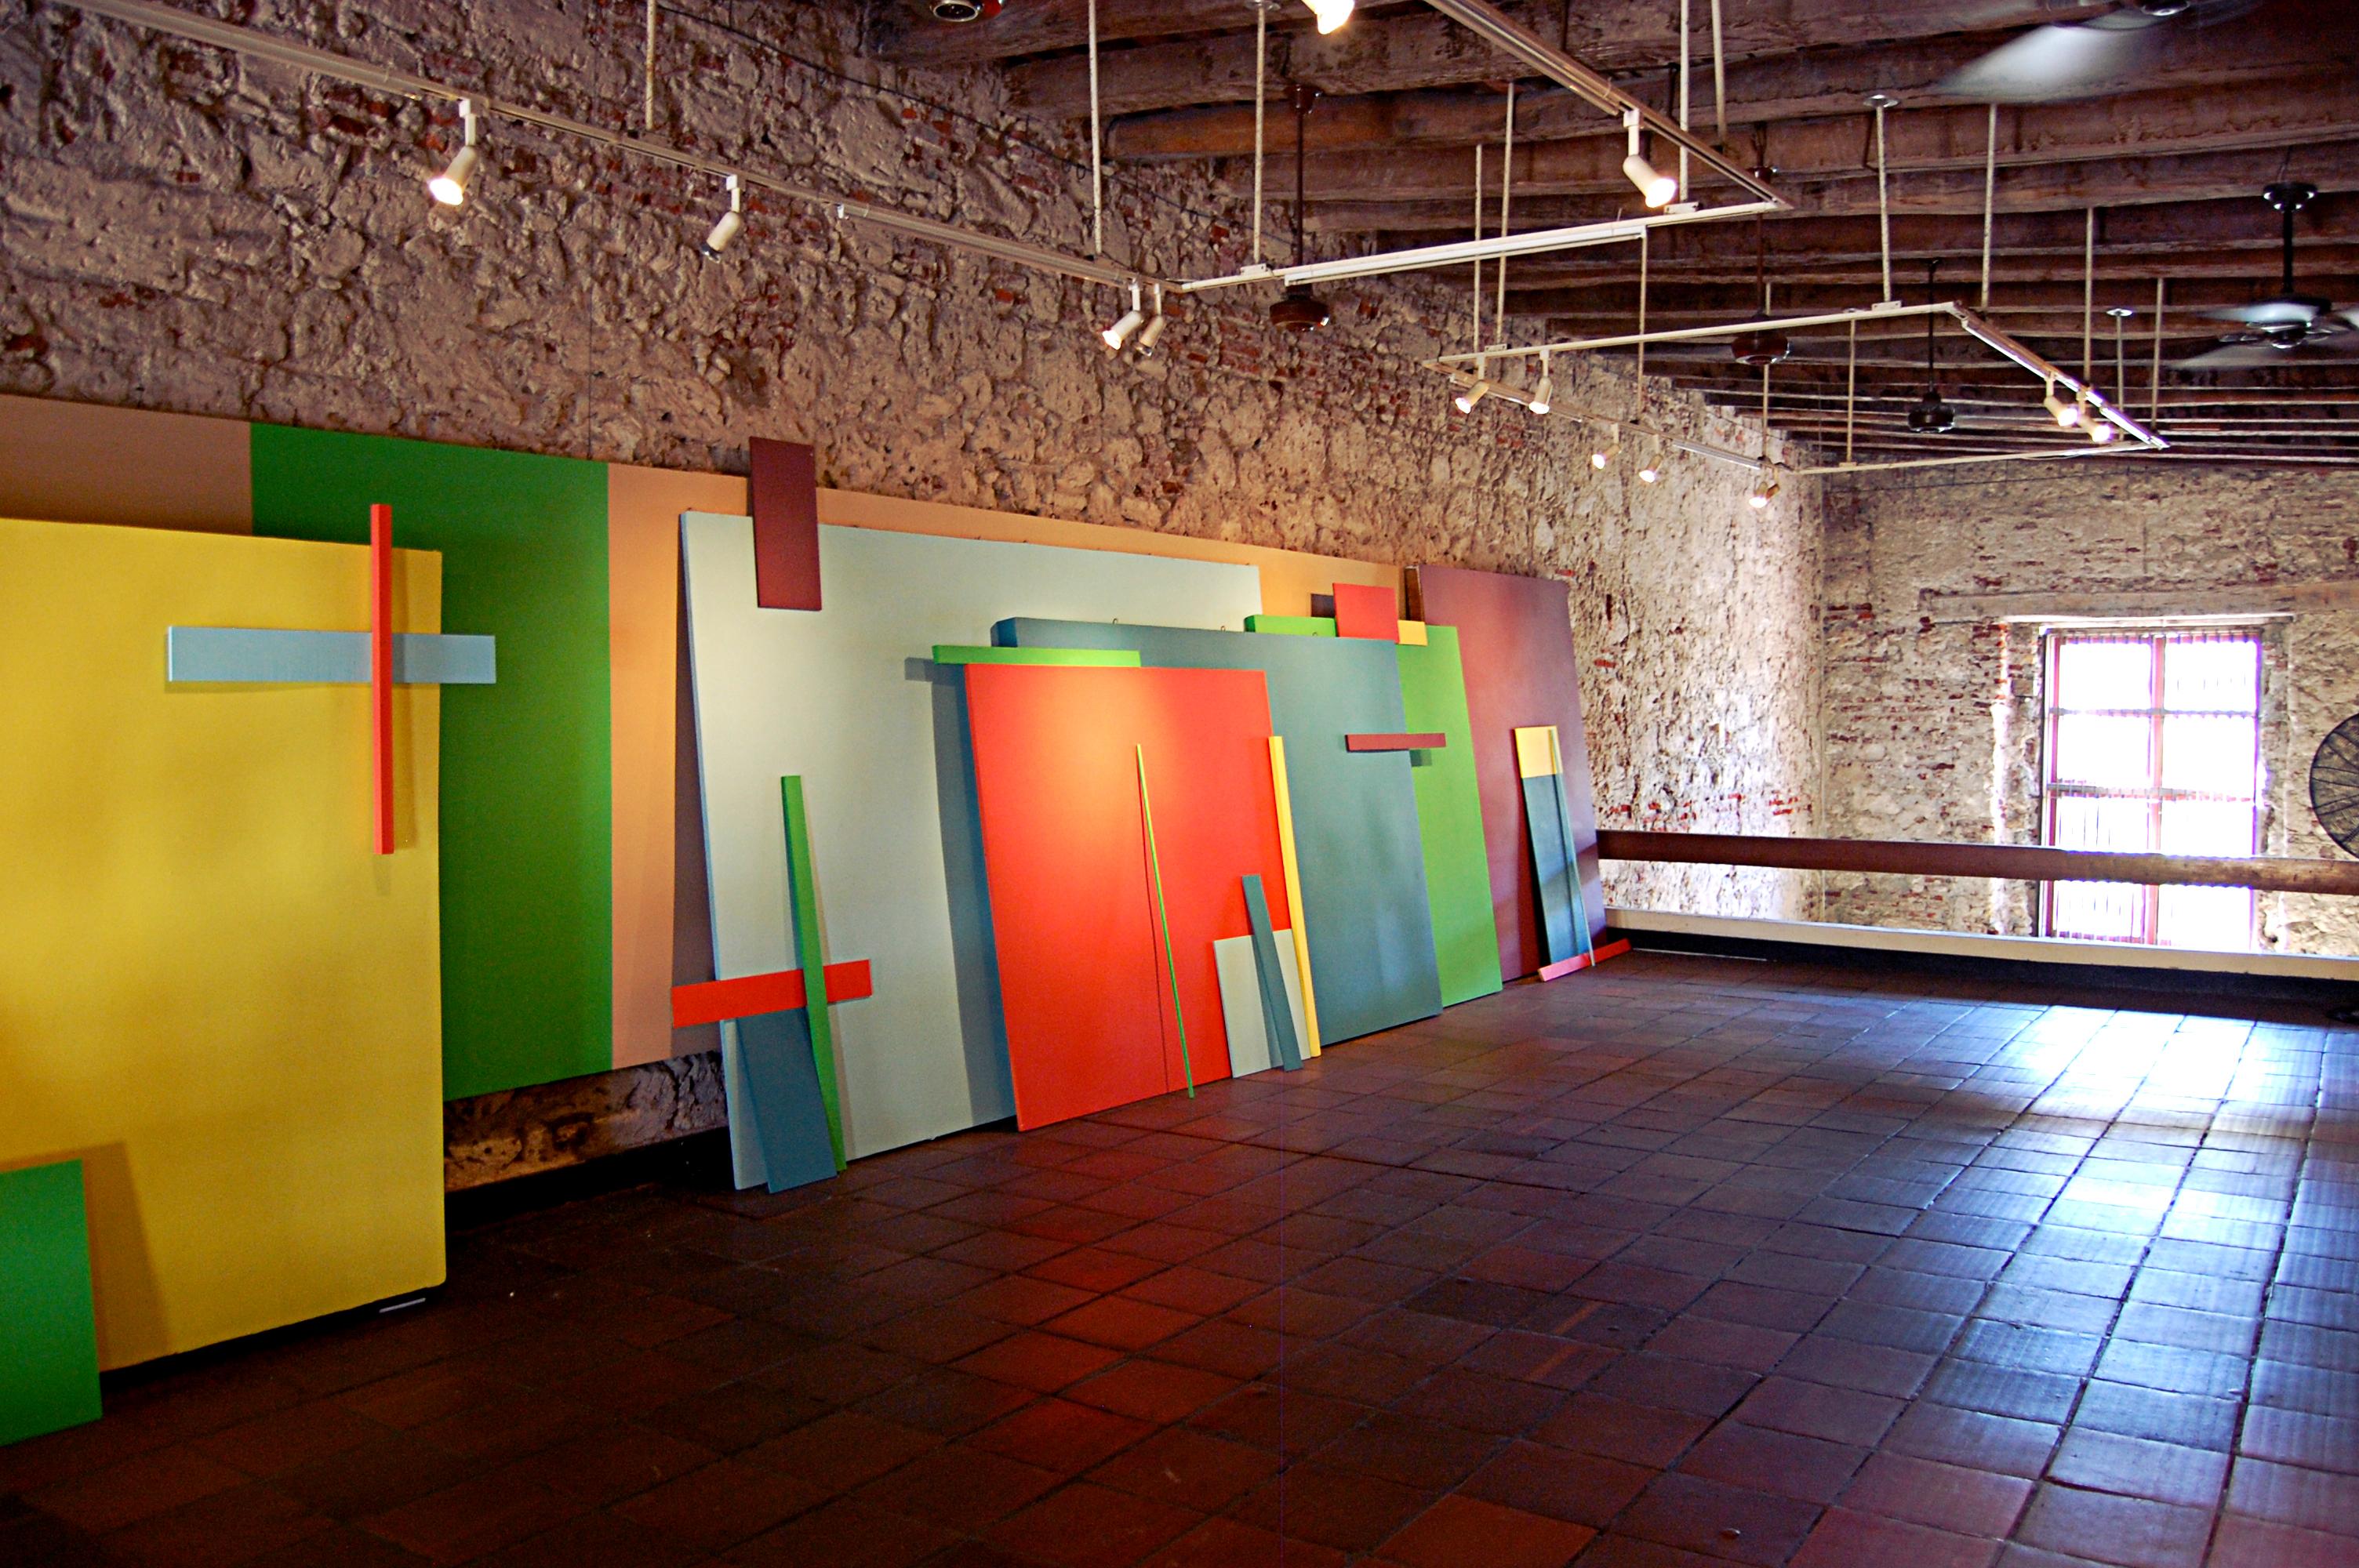 File:Museo de Arte Moderno de Cartagena.jpg